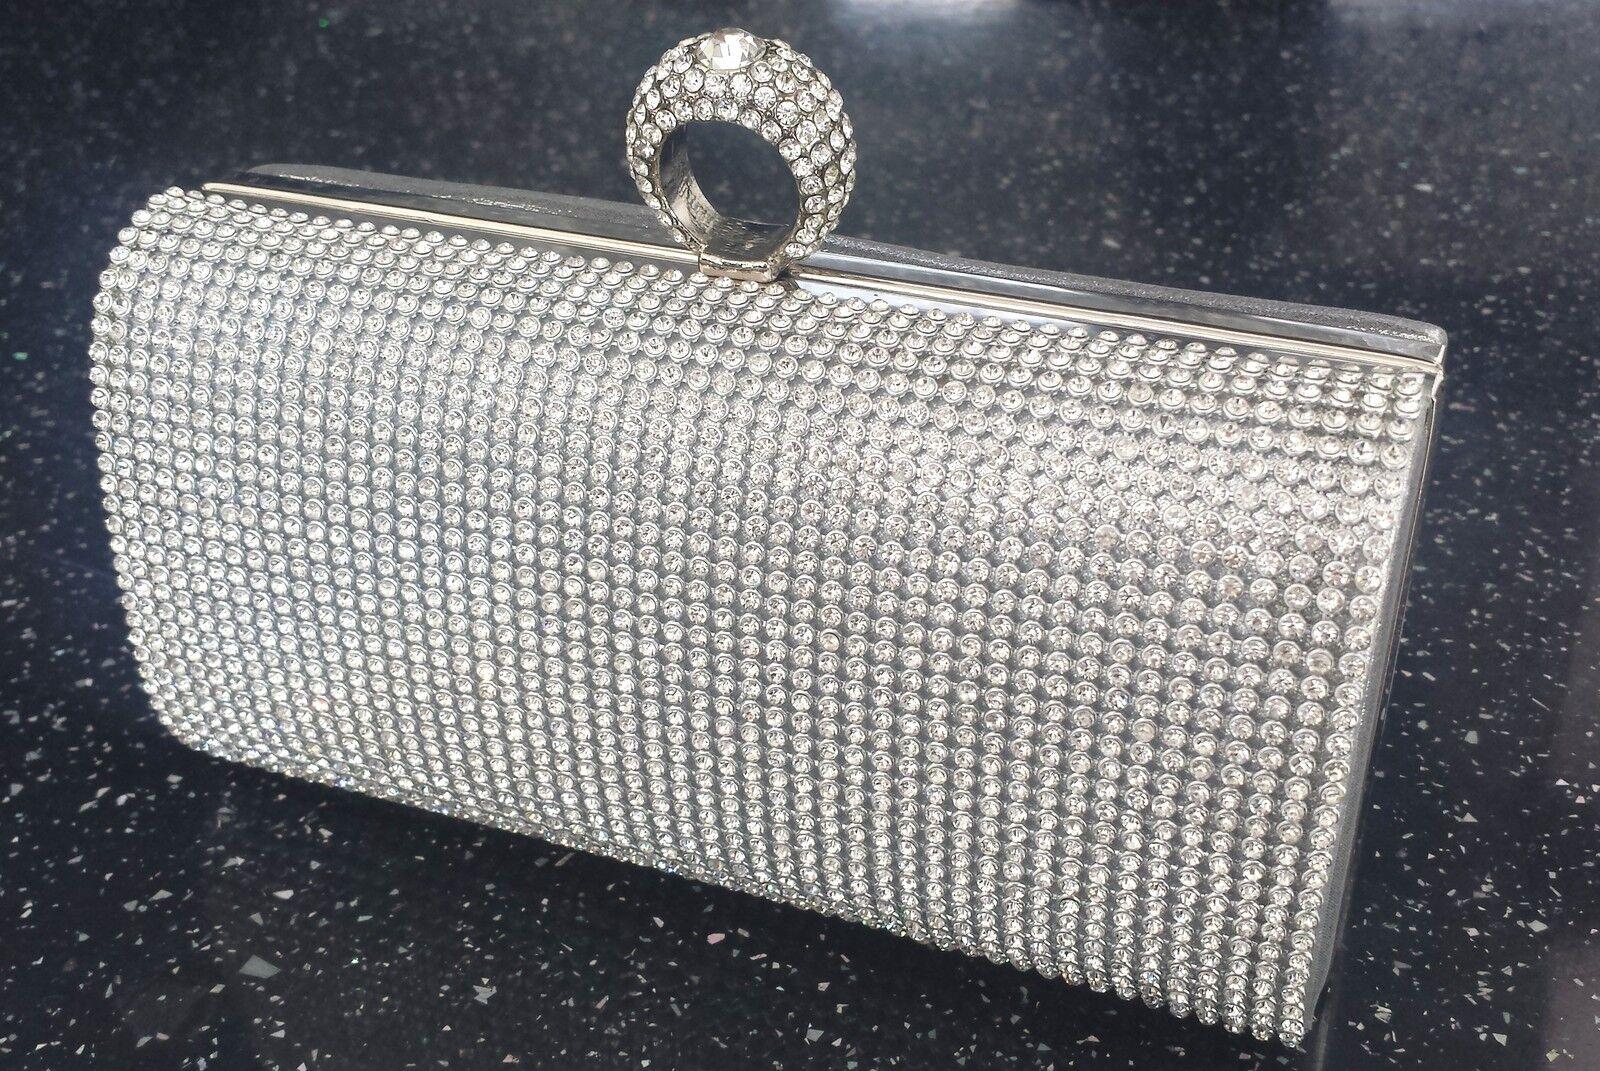 Bling Silver Diamante Diamond Crystal Evening bag Clutch Purse Party Prom Bride